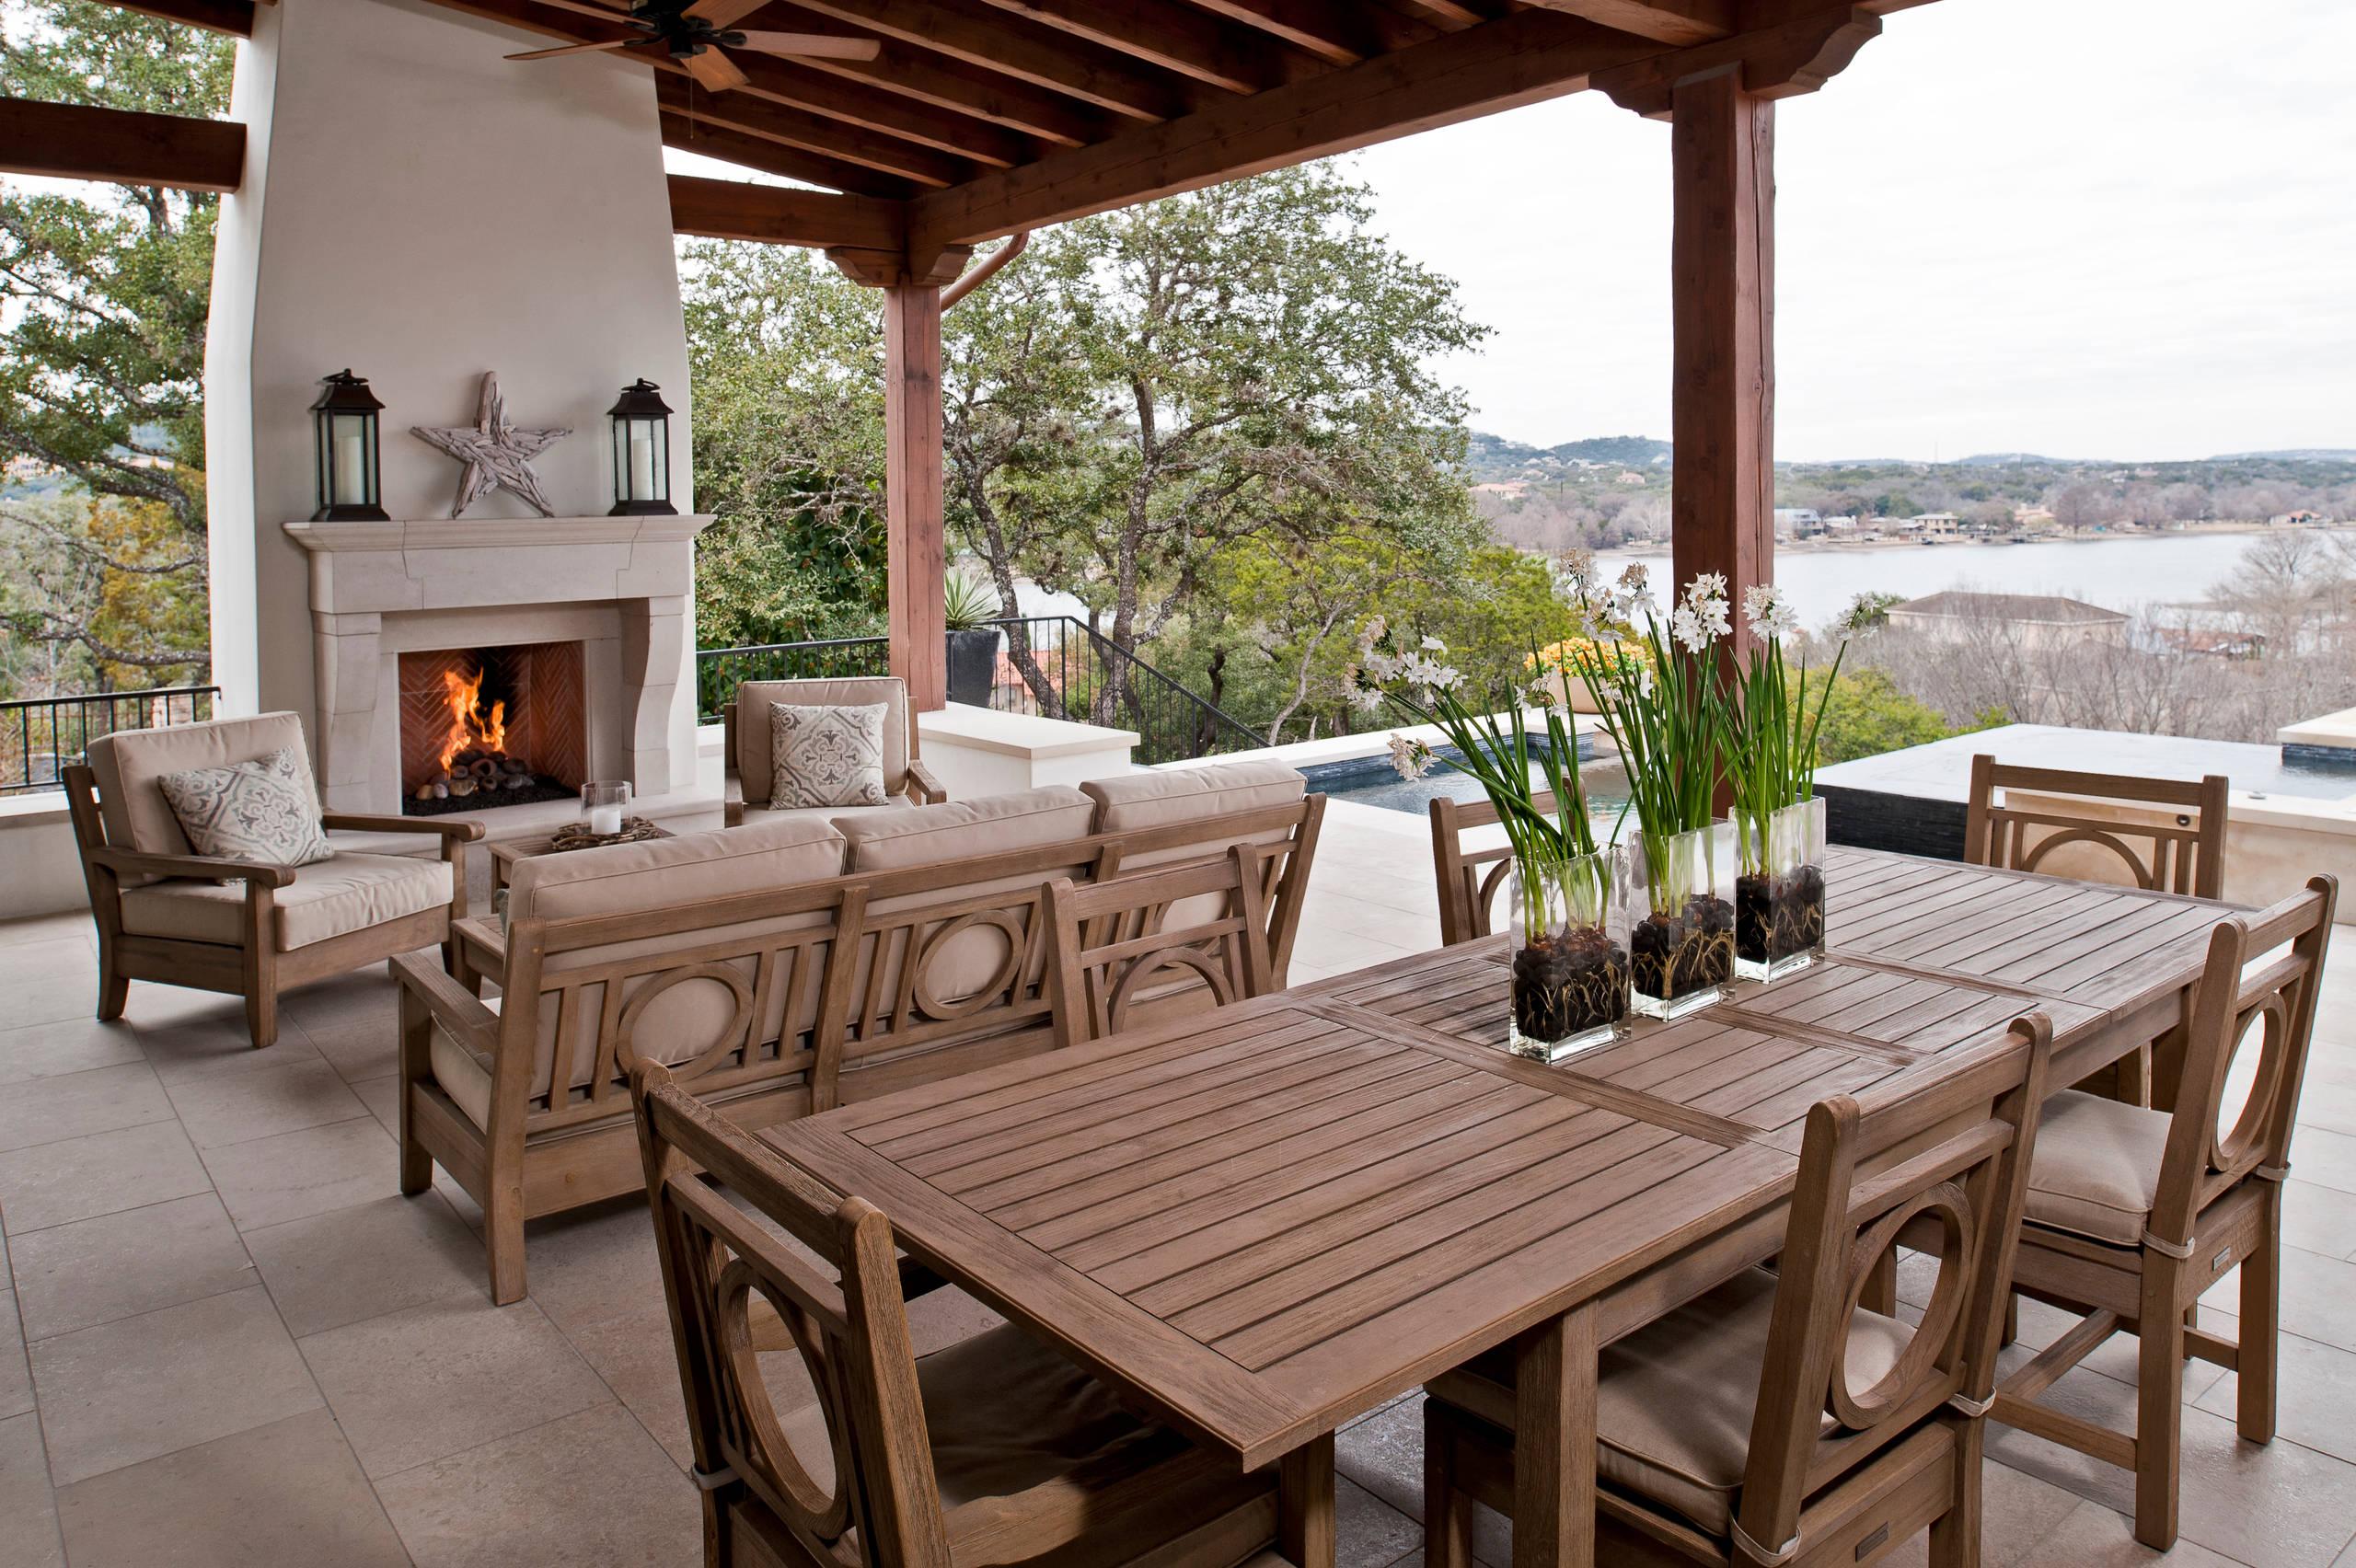 20 Stunning Mediterranean Porch Designs You Ll Fall In